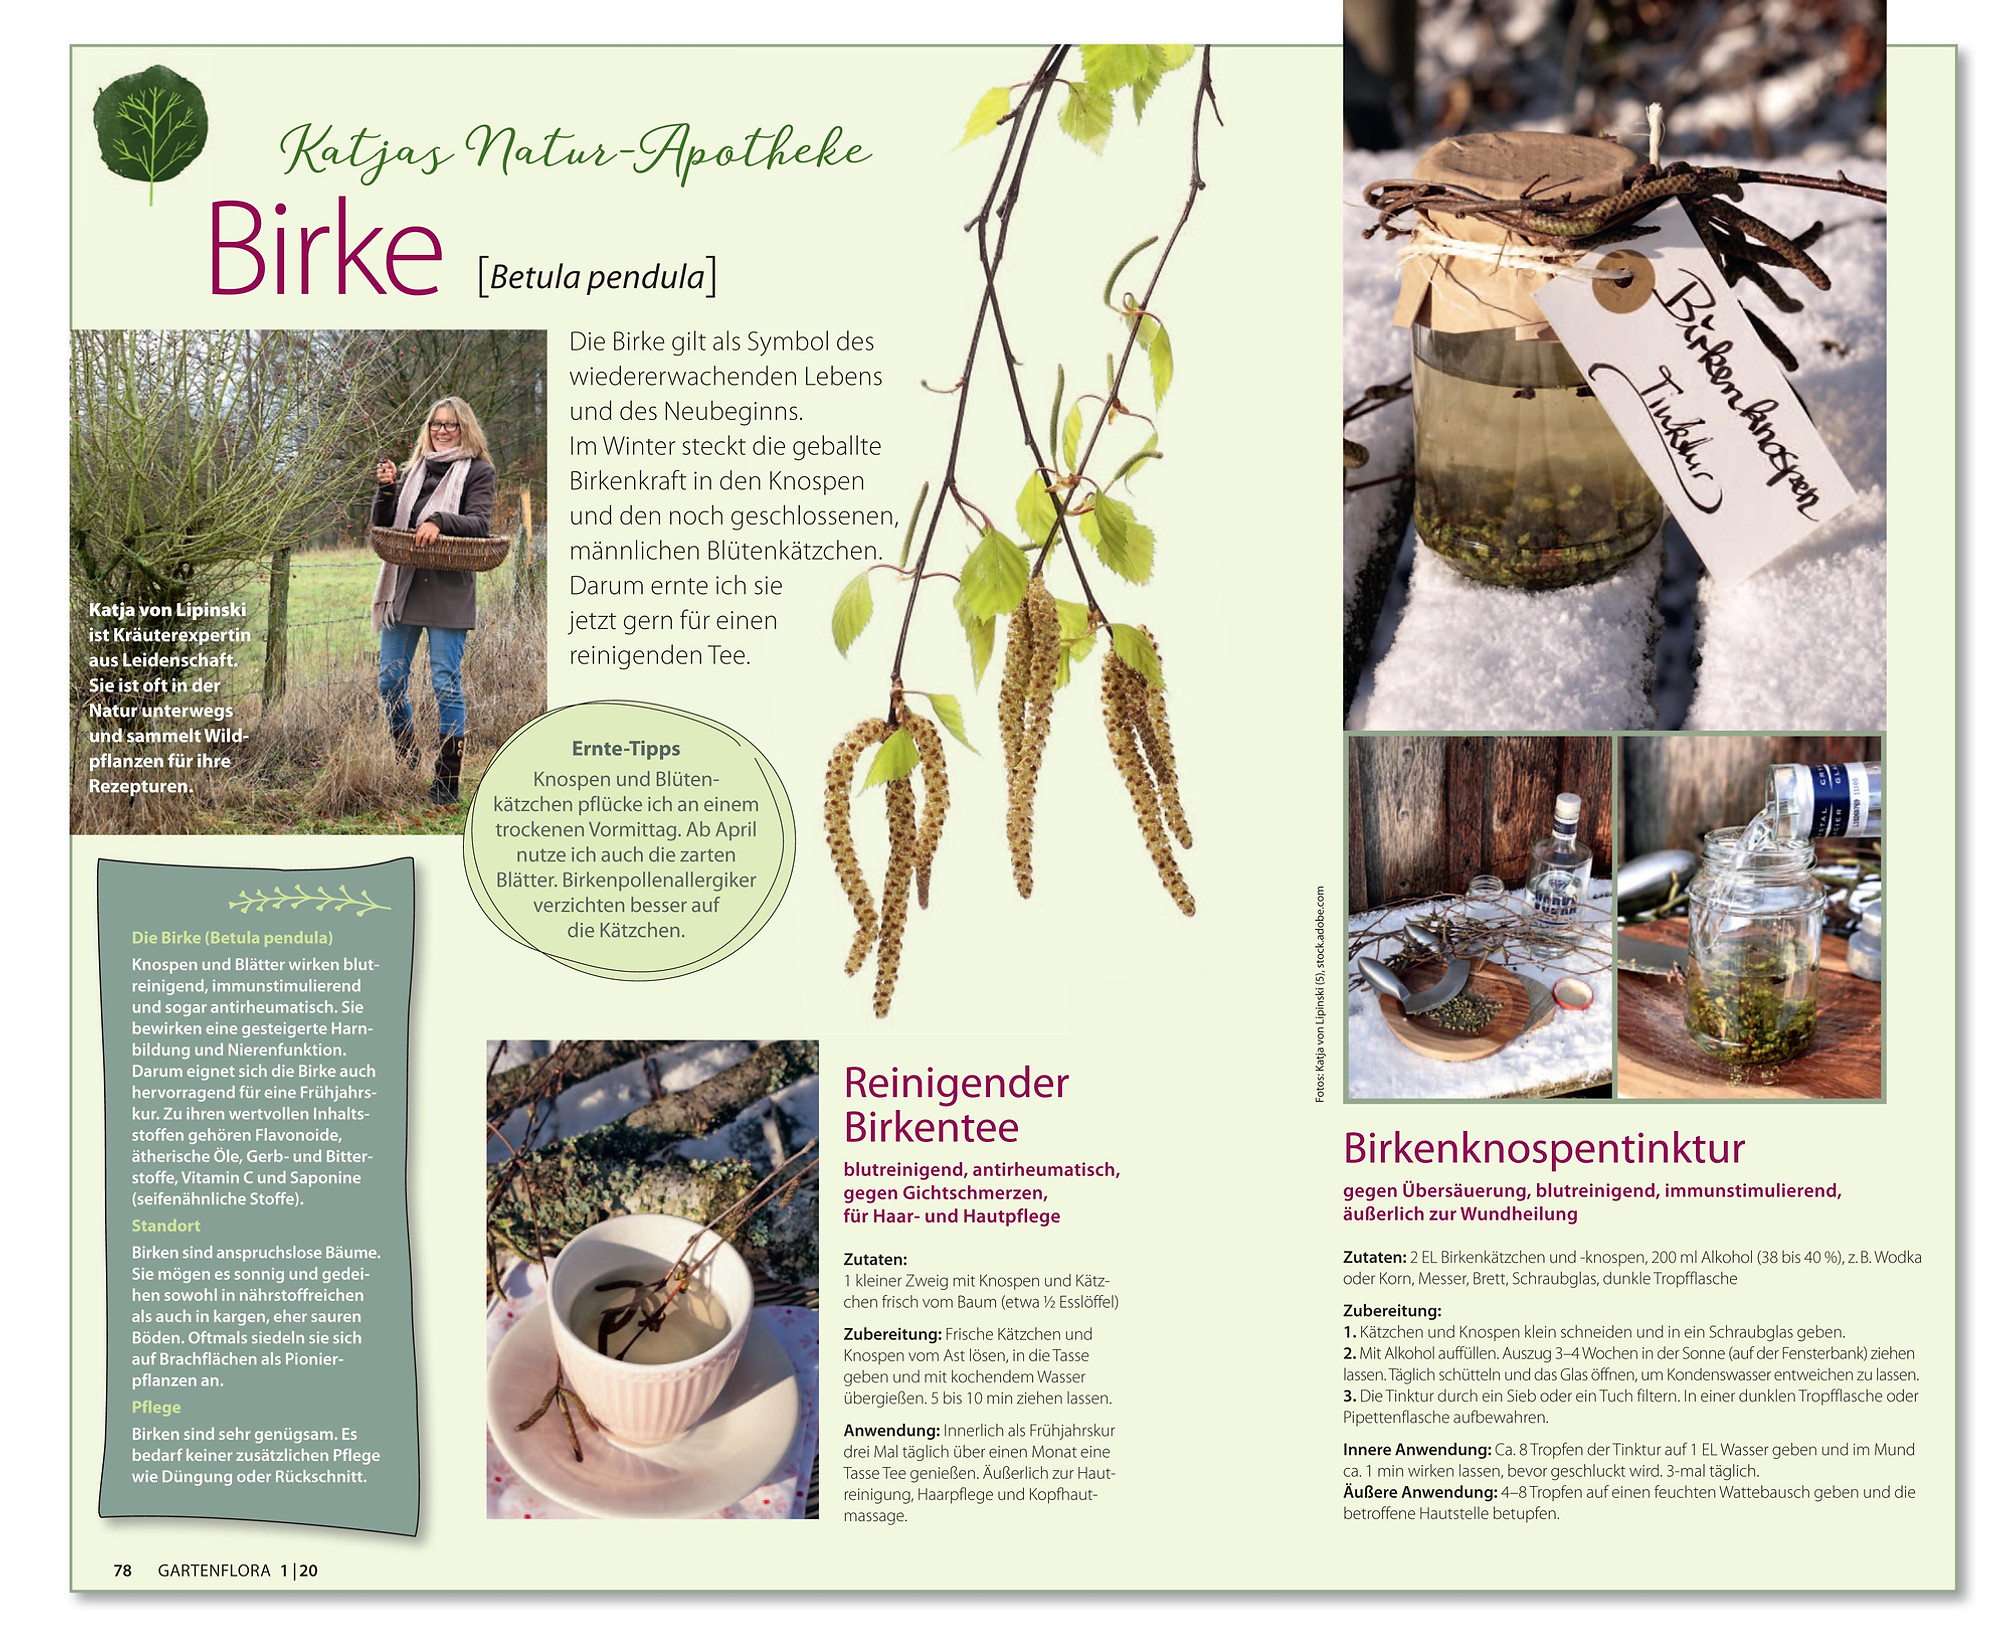 Katjas Natur-Apotheke 01 20 GartenFlora.